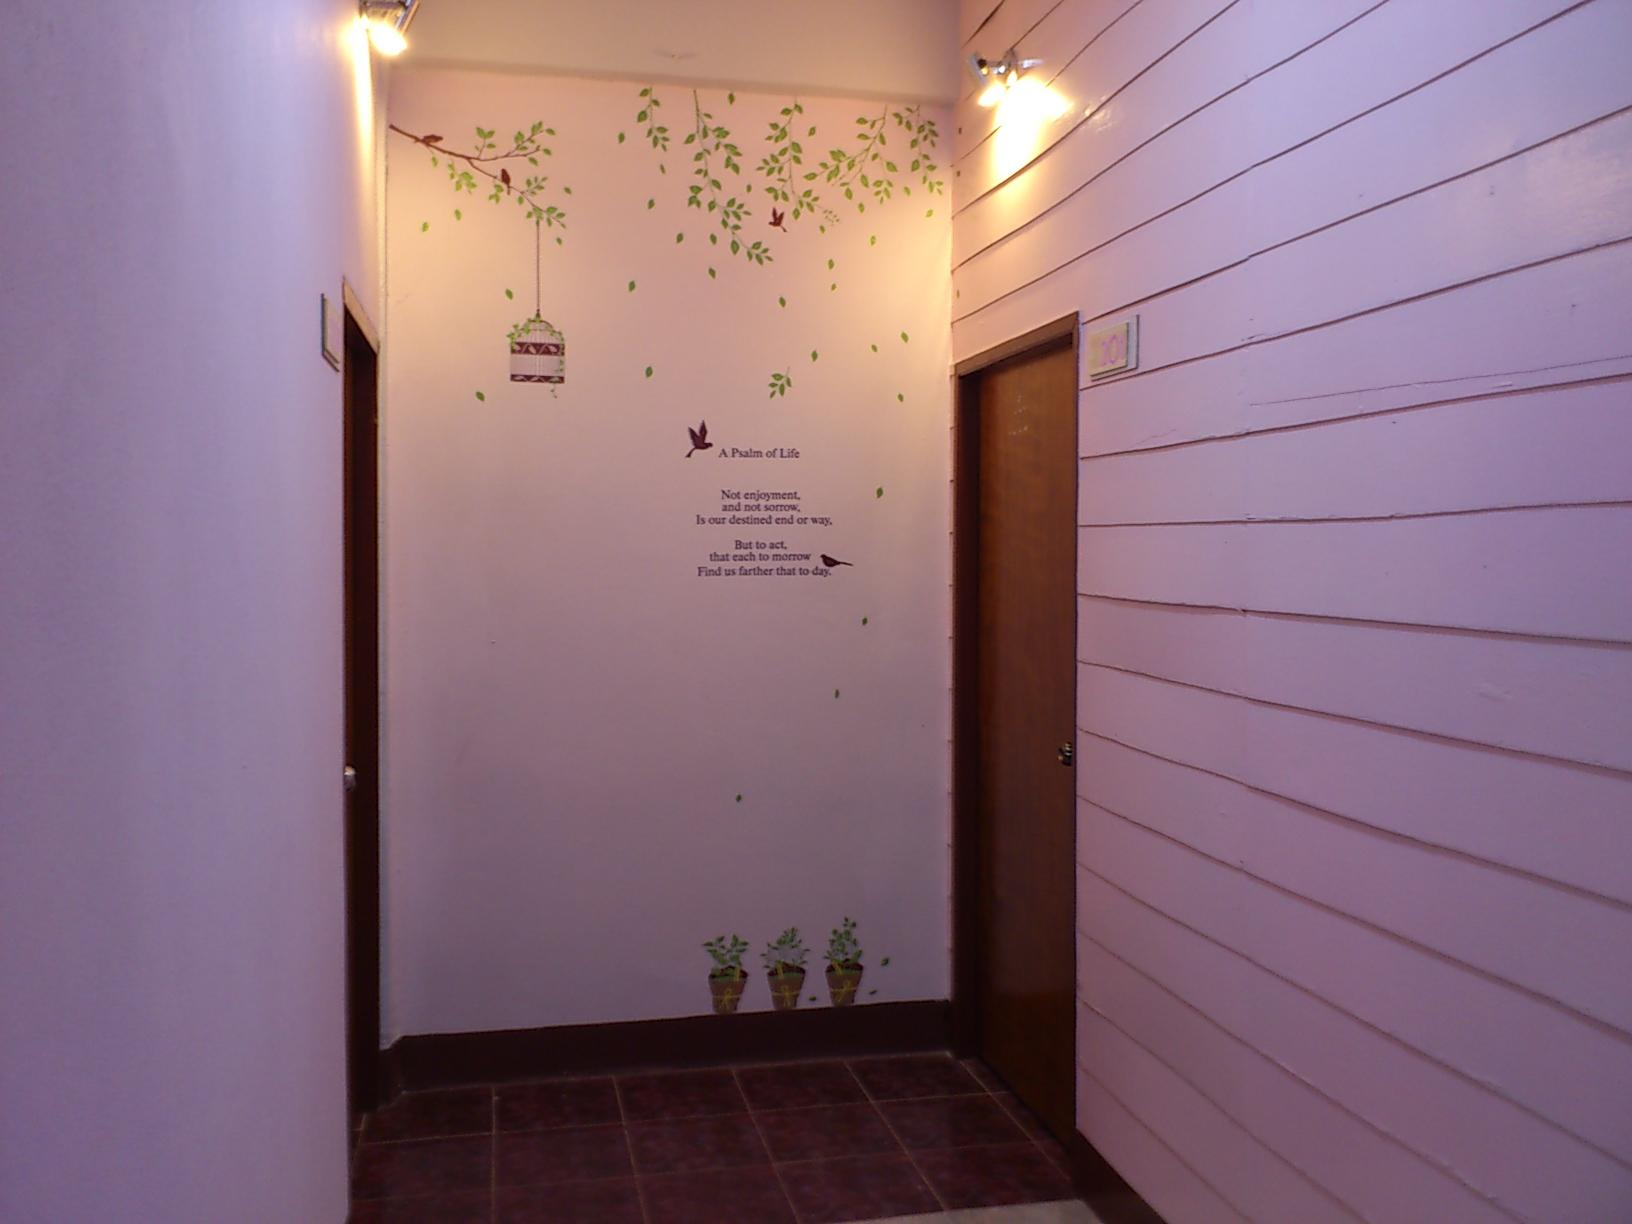 Baan Saen Rak Apartment and Exclusive Hostel,บ้าน แสน รัก อพาร์ตเมนต์ แอนด์ เอ็กซ์คลูซีฟ โฮสเทล